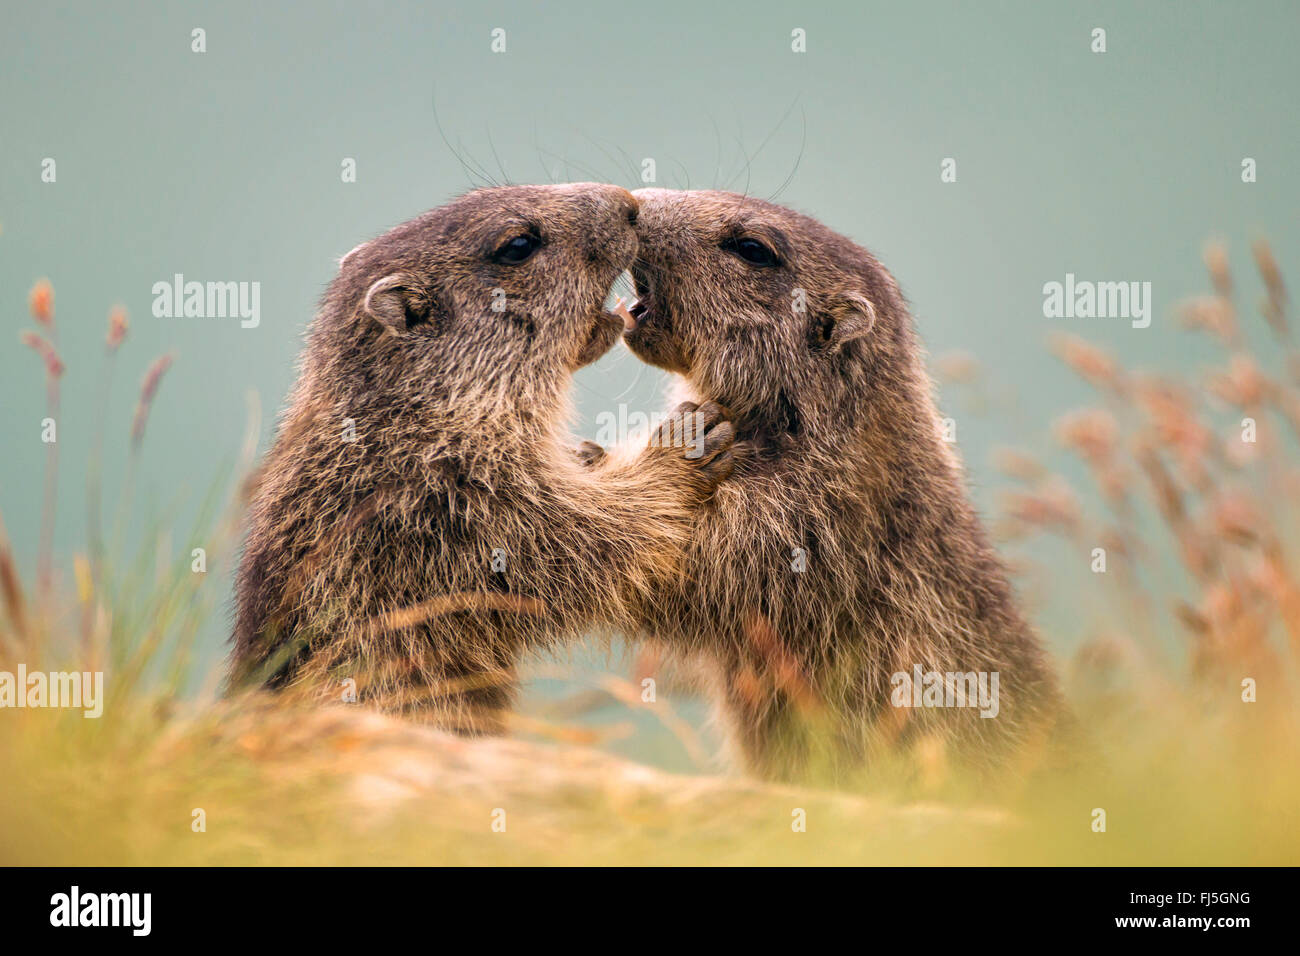 alpine marmot (Marmota marmota), two romping young animals, Austria, Kaernten, Hohe Tauern National Park, Grossglockner Stock Photo